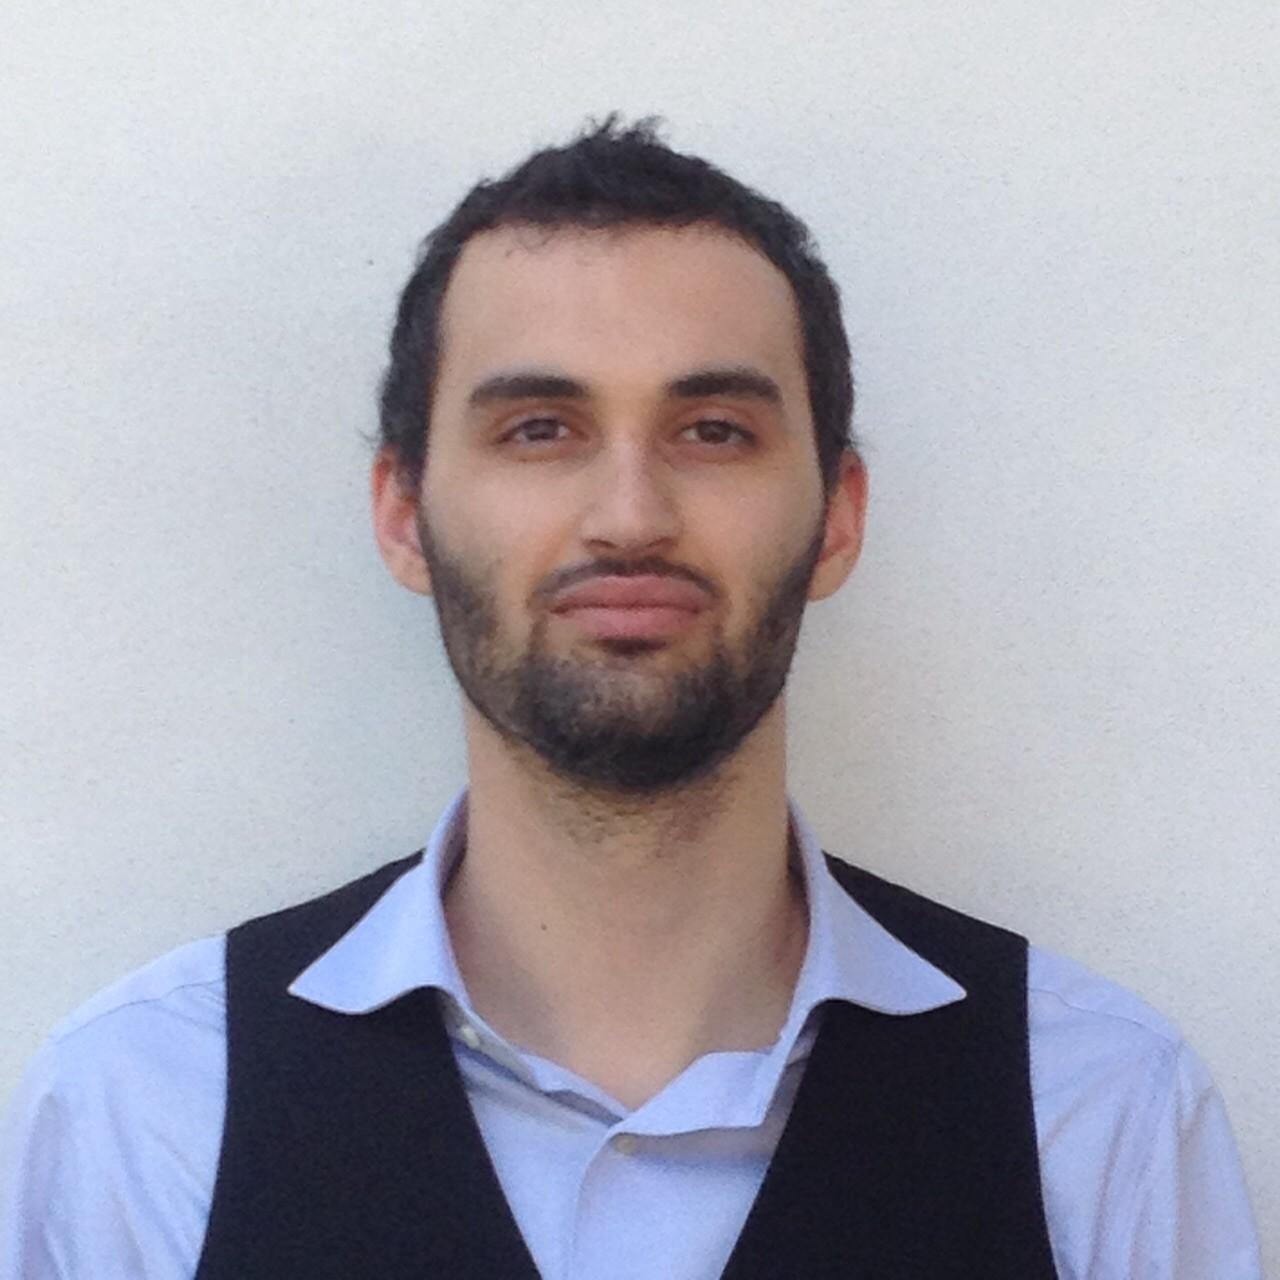 Francesco Gazza